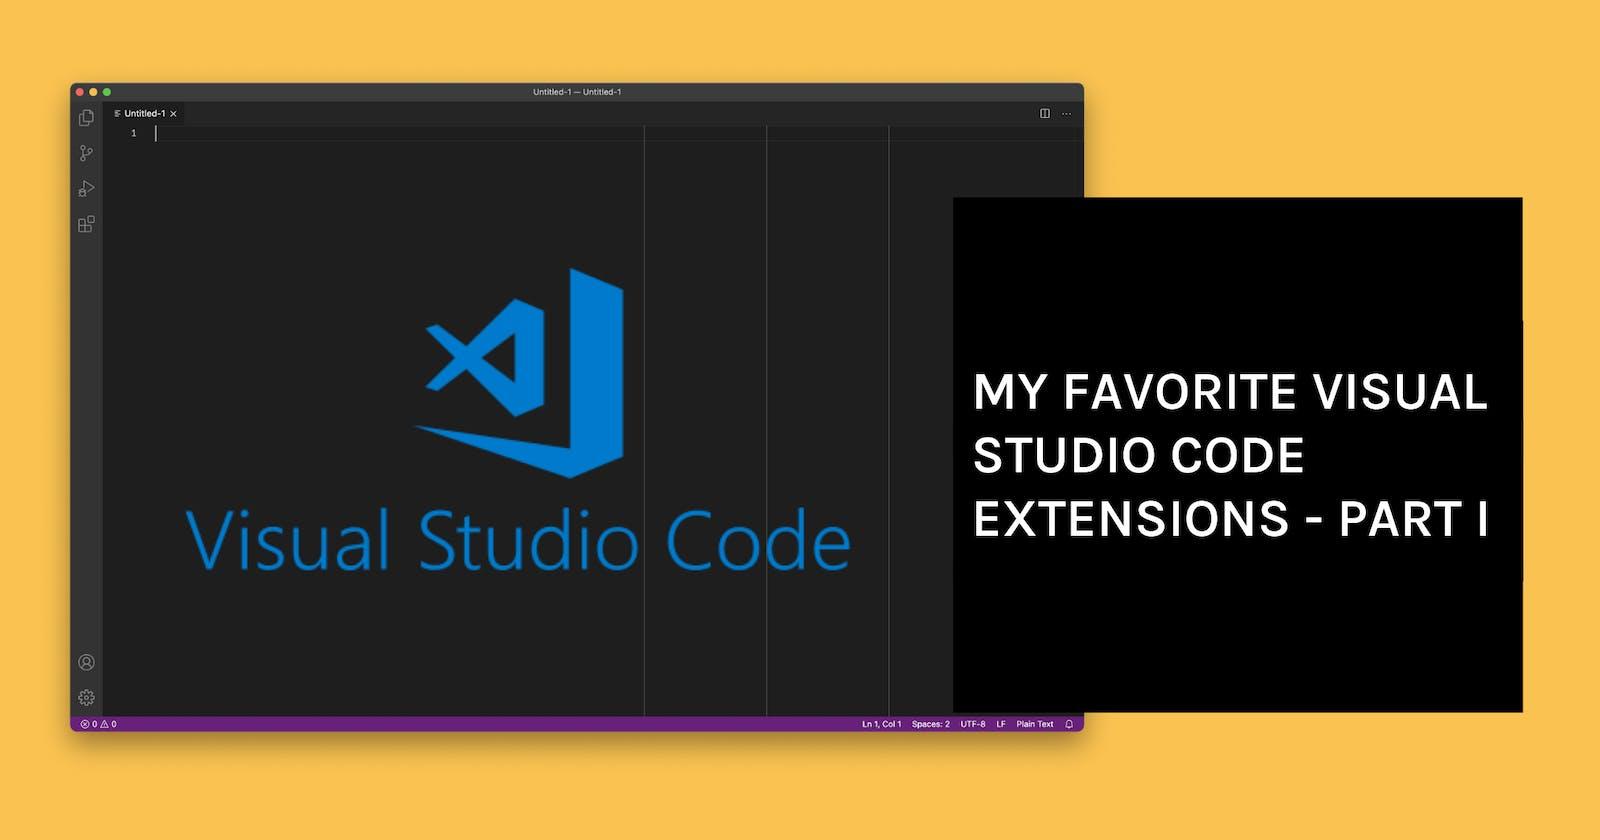 My Favorite Visual Studio Code Extensions - Part I